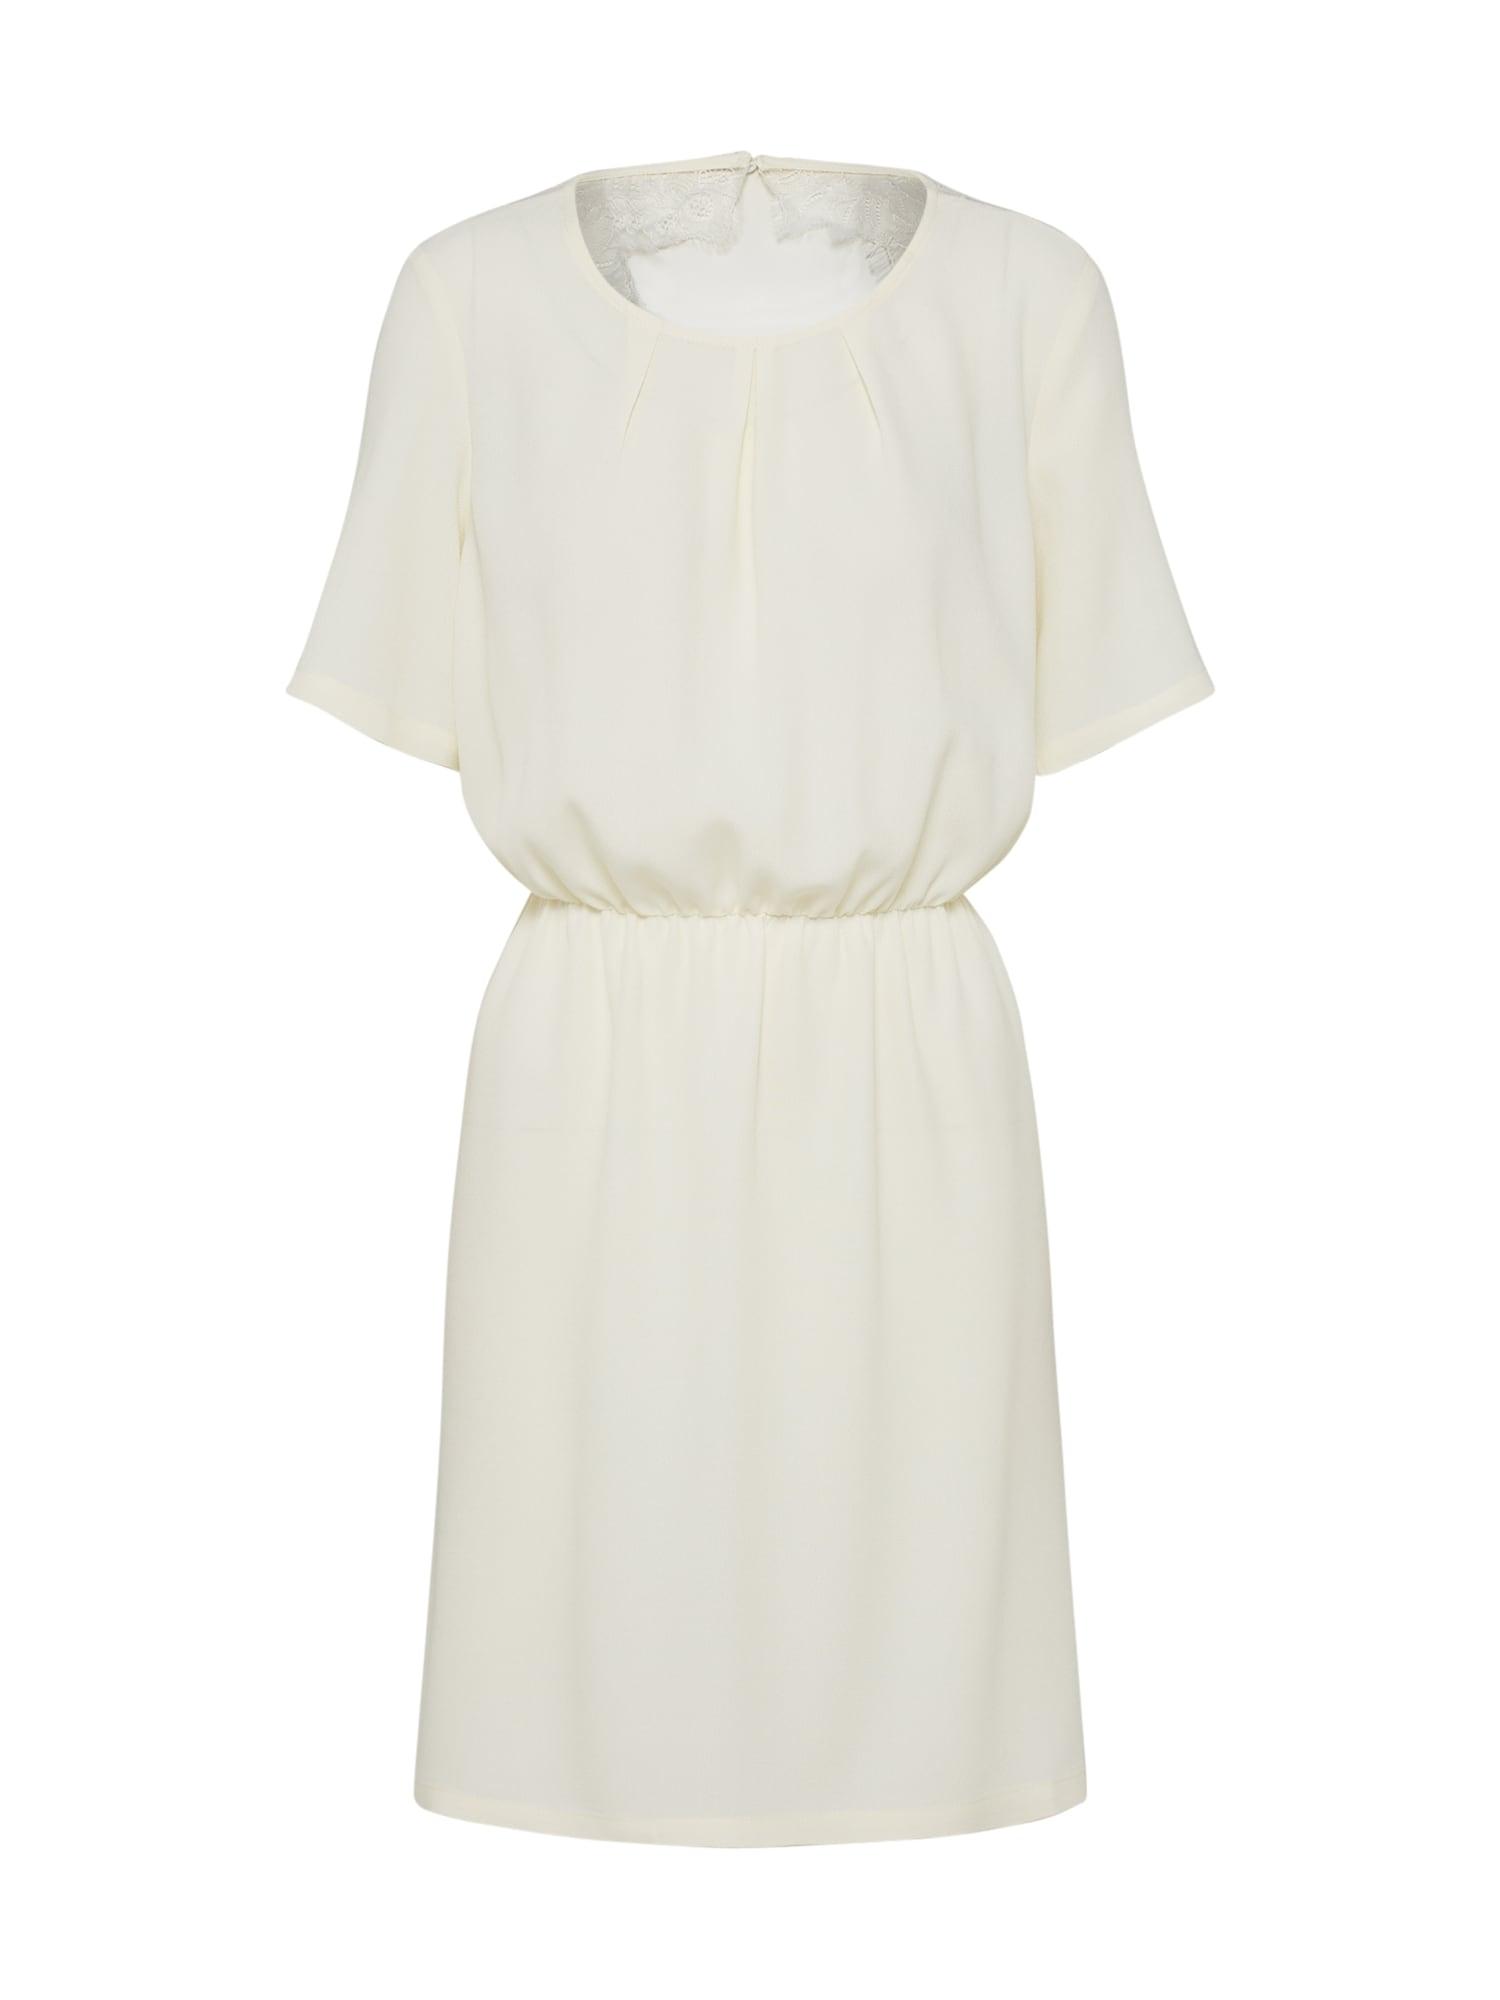 Koktejlové šaty Clarina bílá Minimum